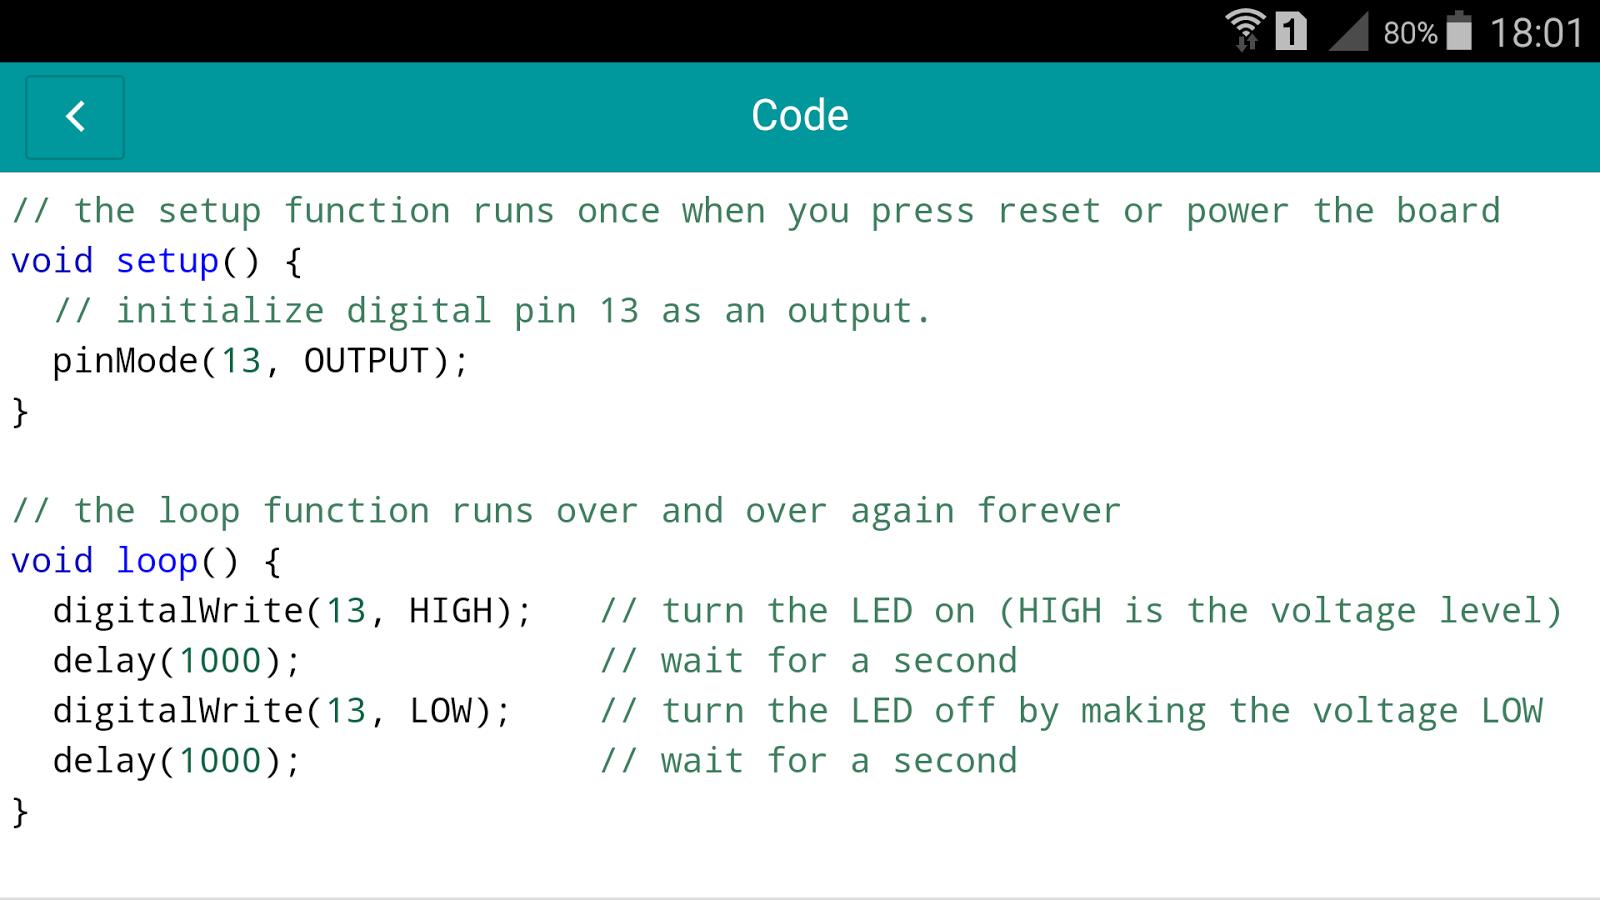 arduino-codes-app-2